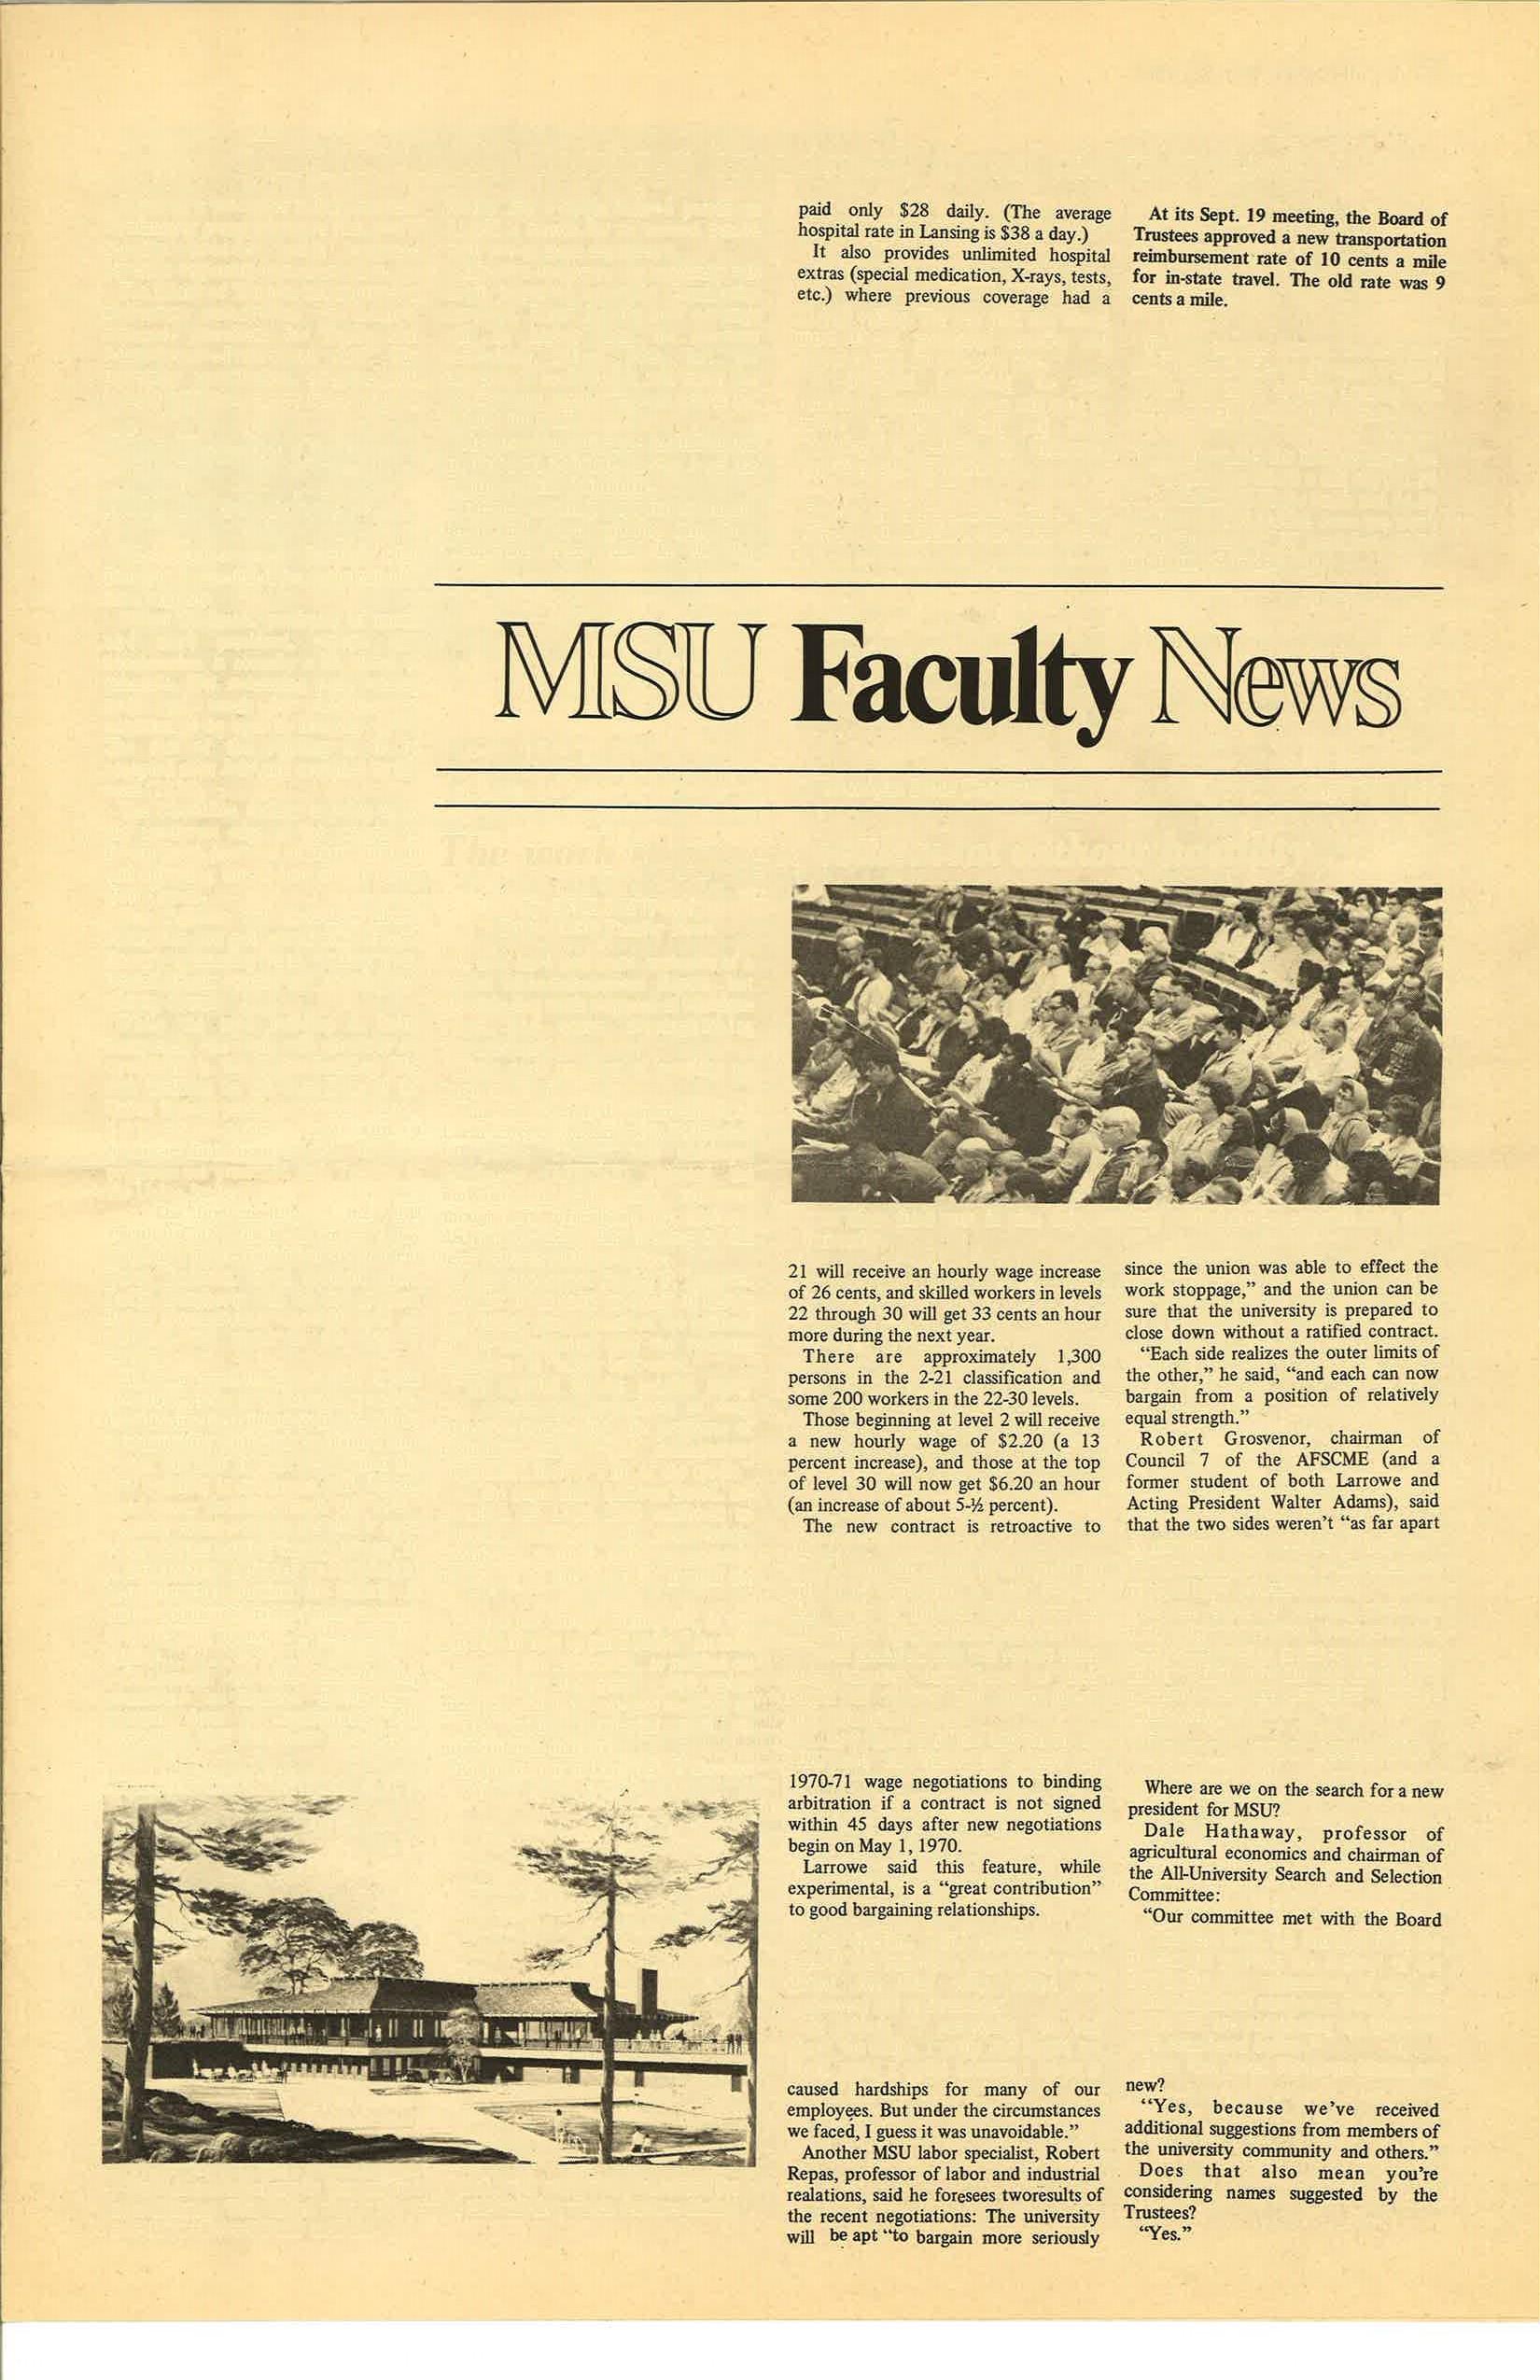 MSU News Bulletin, Vol. 1 No. 3, October 14, 1969